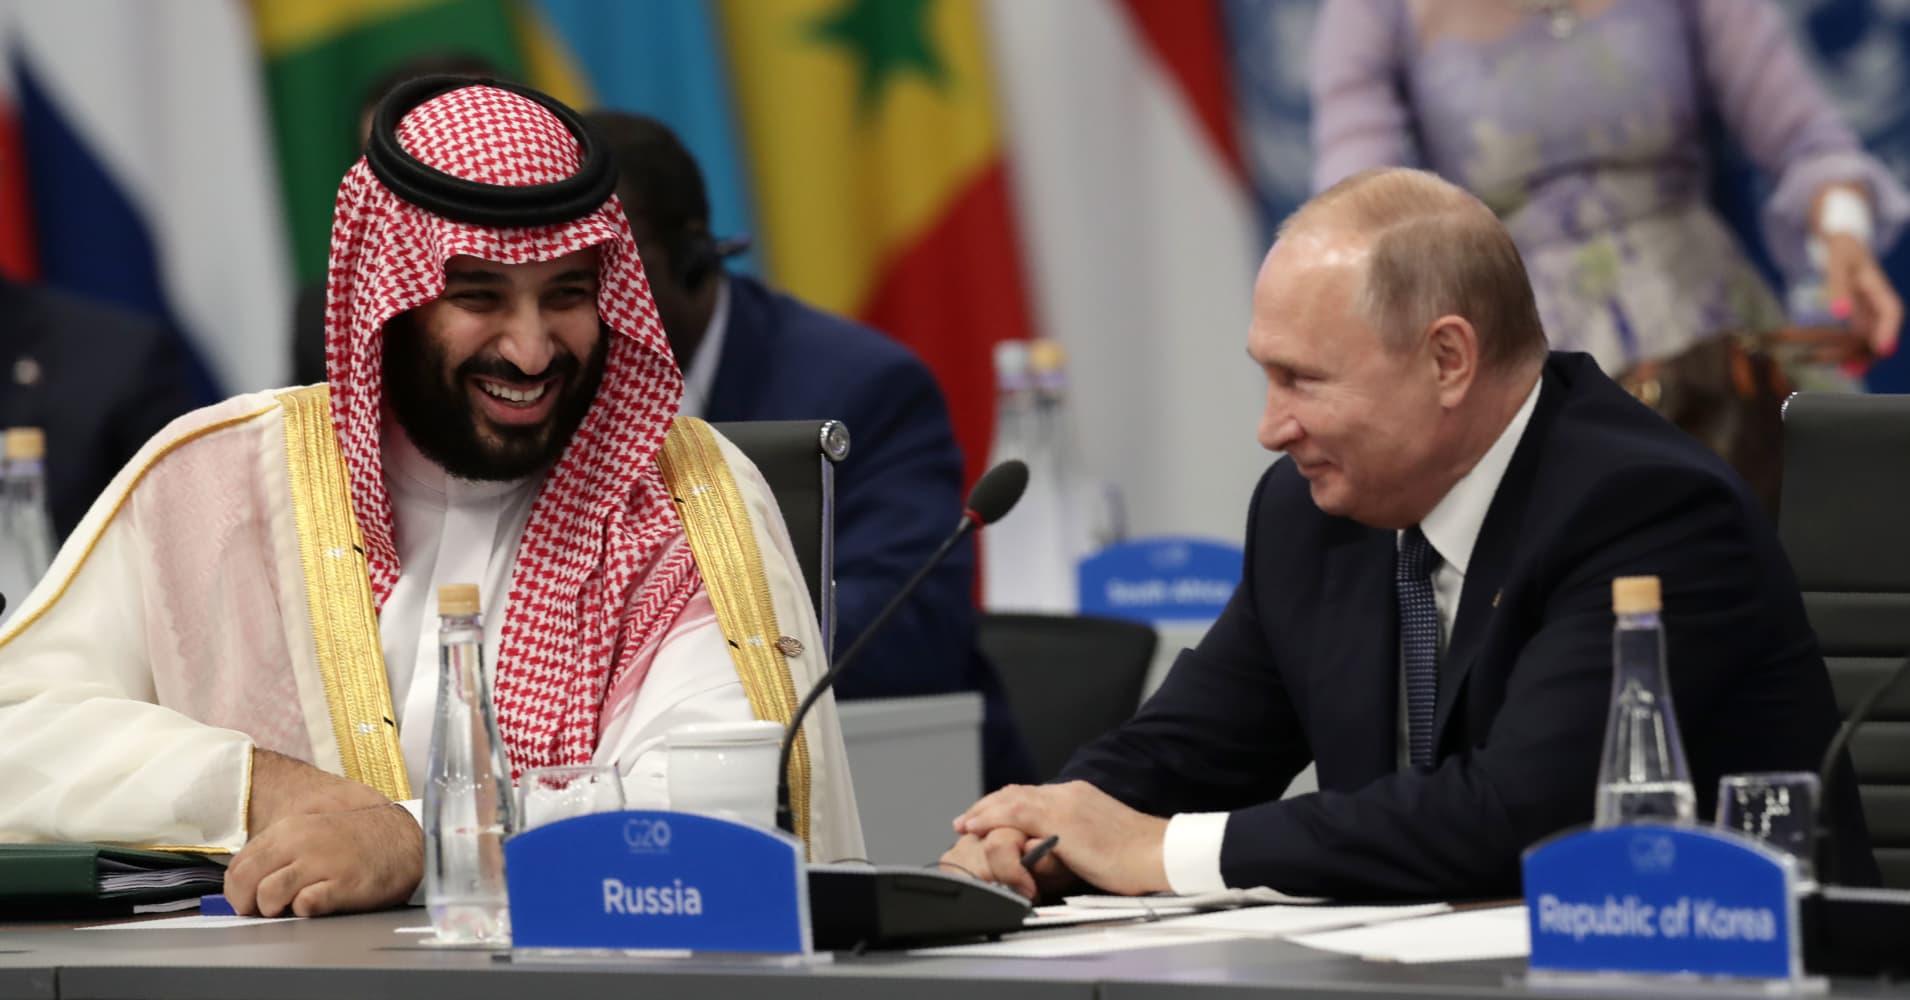 Watch Putin and Saudi Crown Prince MBS exuberant handshake at G-20